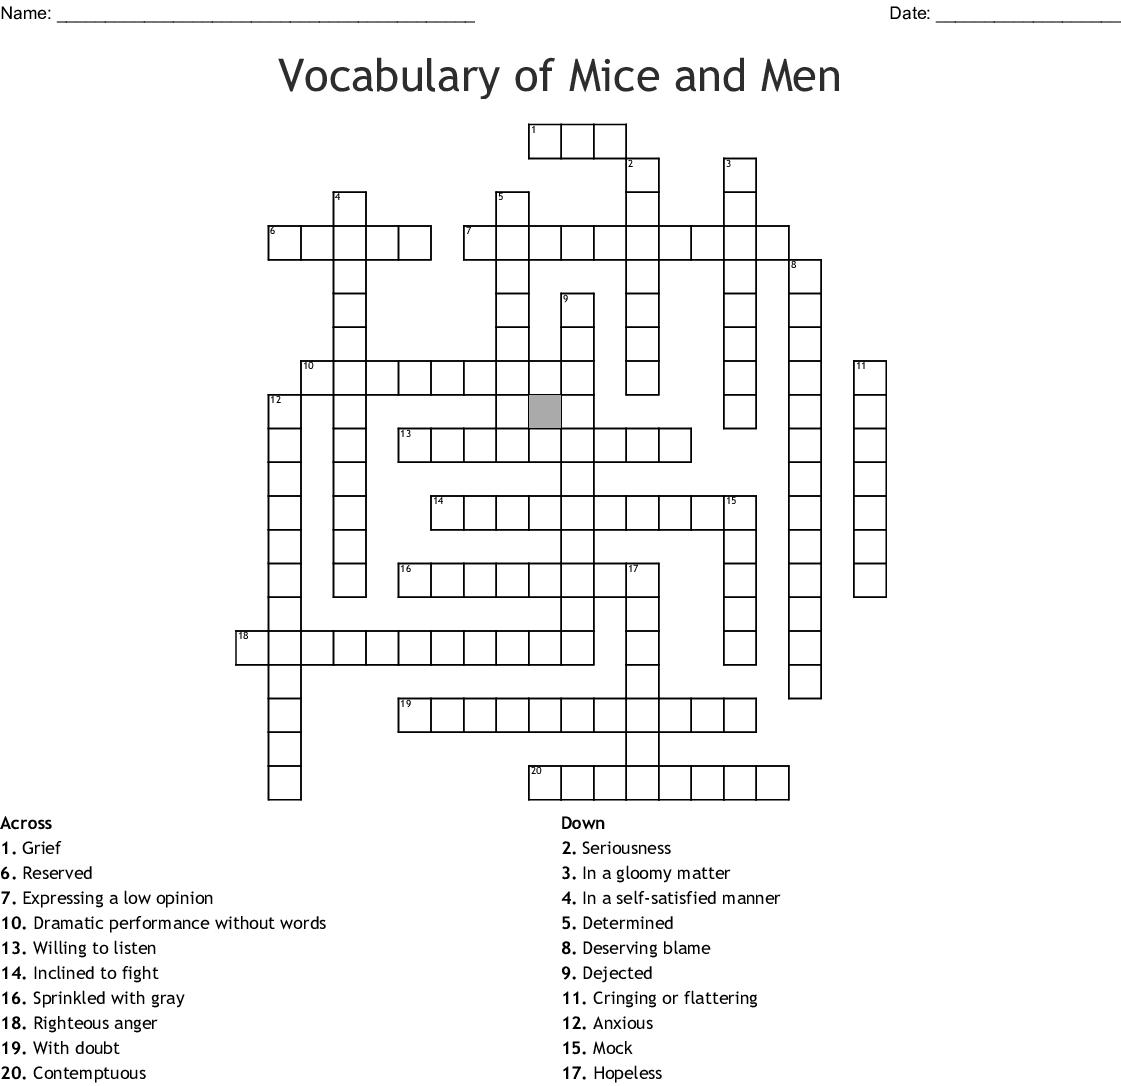 Of Mice And Men Vocabulary Crossword